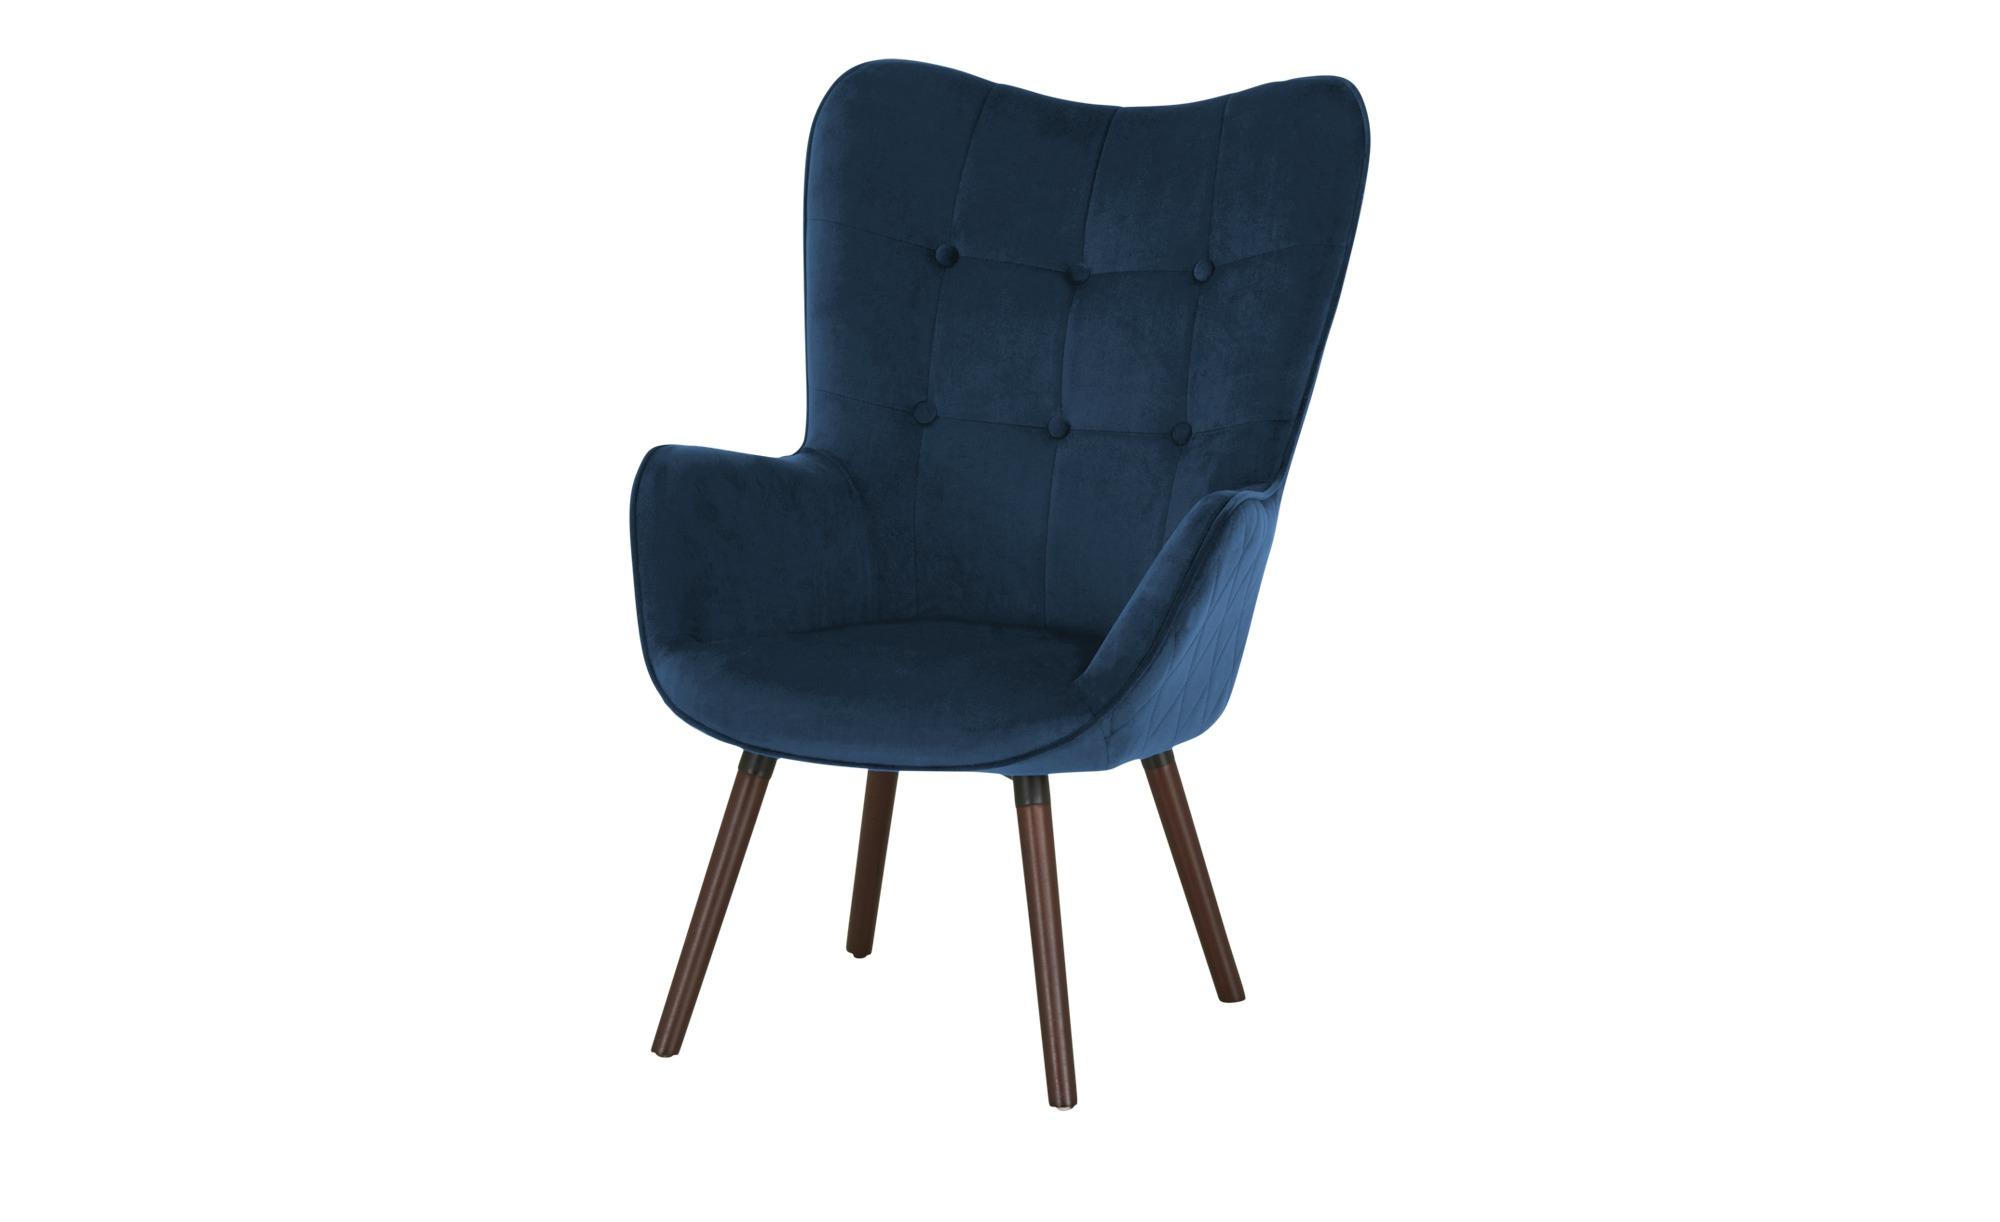 Playboy Sessel  Bridget ¦ blau ¦ Maße (cm): B: 68 H: 99 T: 77 Polstermöbel > Sessel > Ohrensessel - Höffner